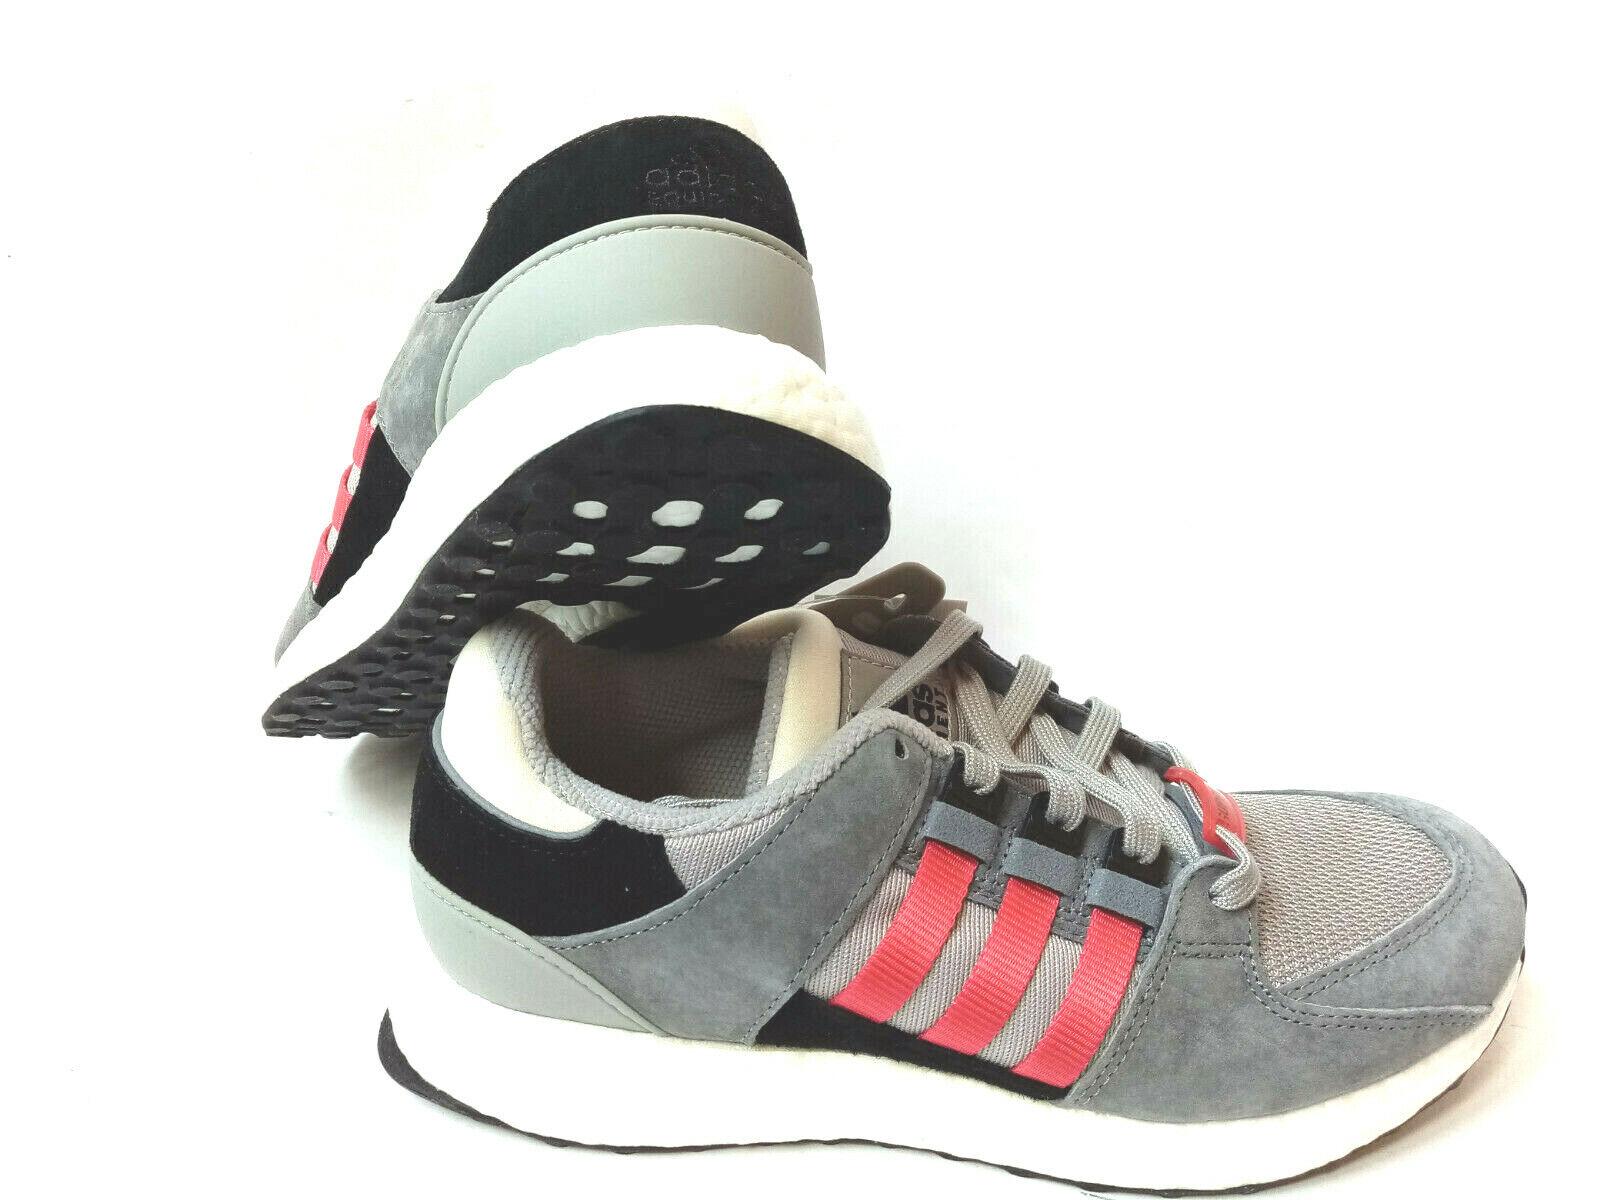 16 Support 93 Equipment grau Schuhe EQT Adidas Schuhe oben eCxQoEBrdW